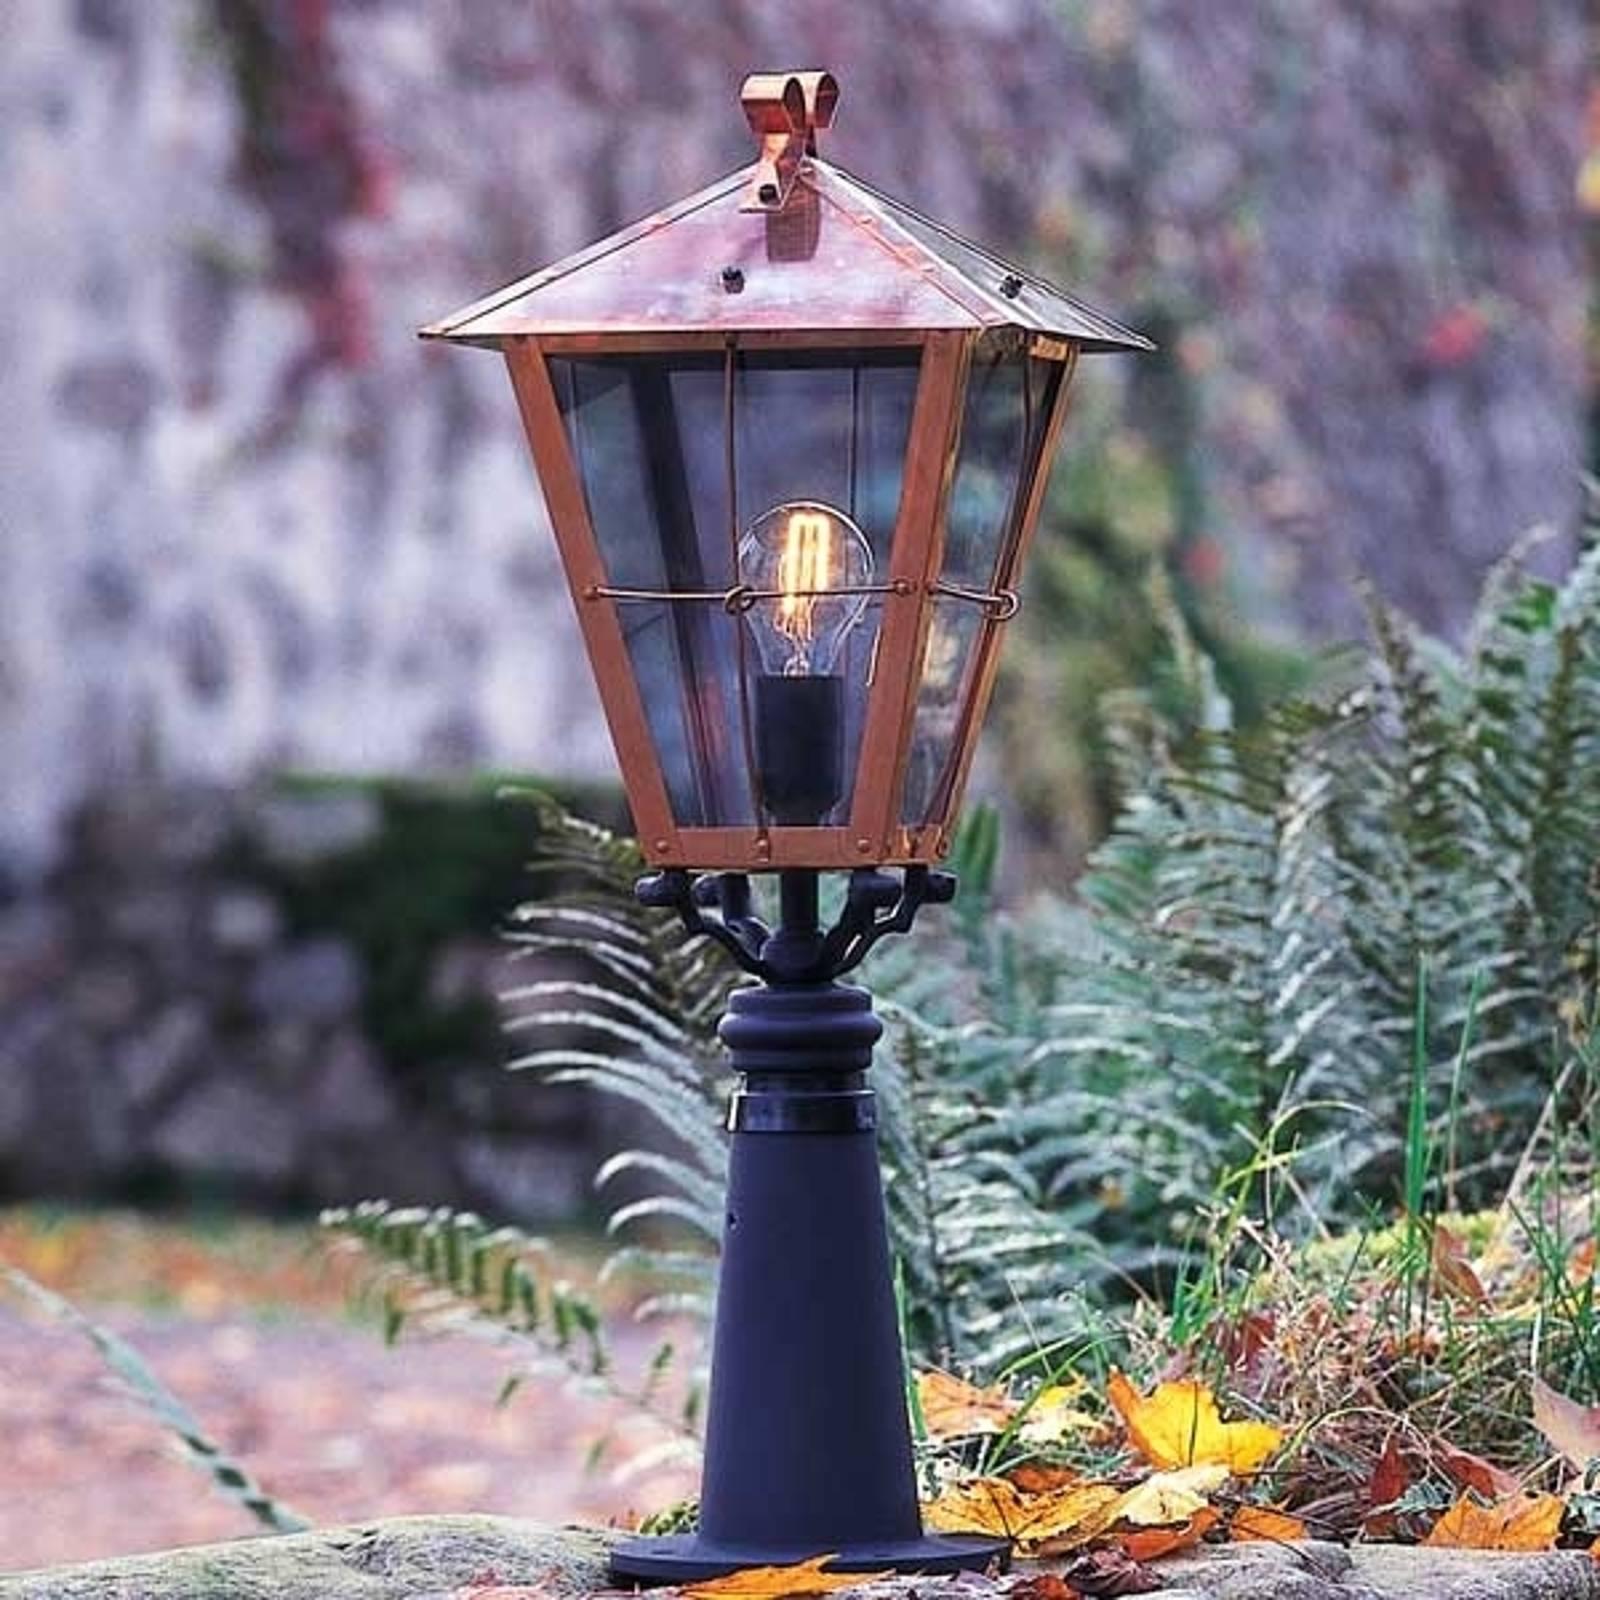 Fenix tuinpadverlichting in koper, 66,5 cm